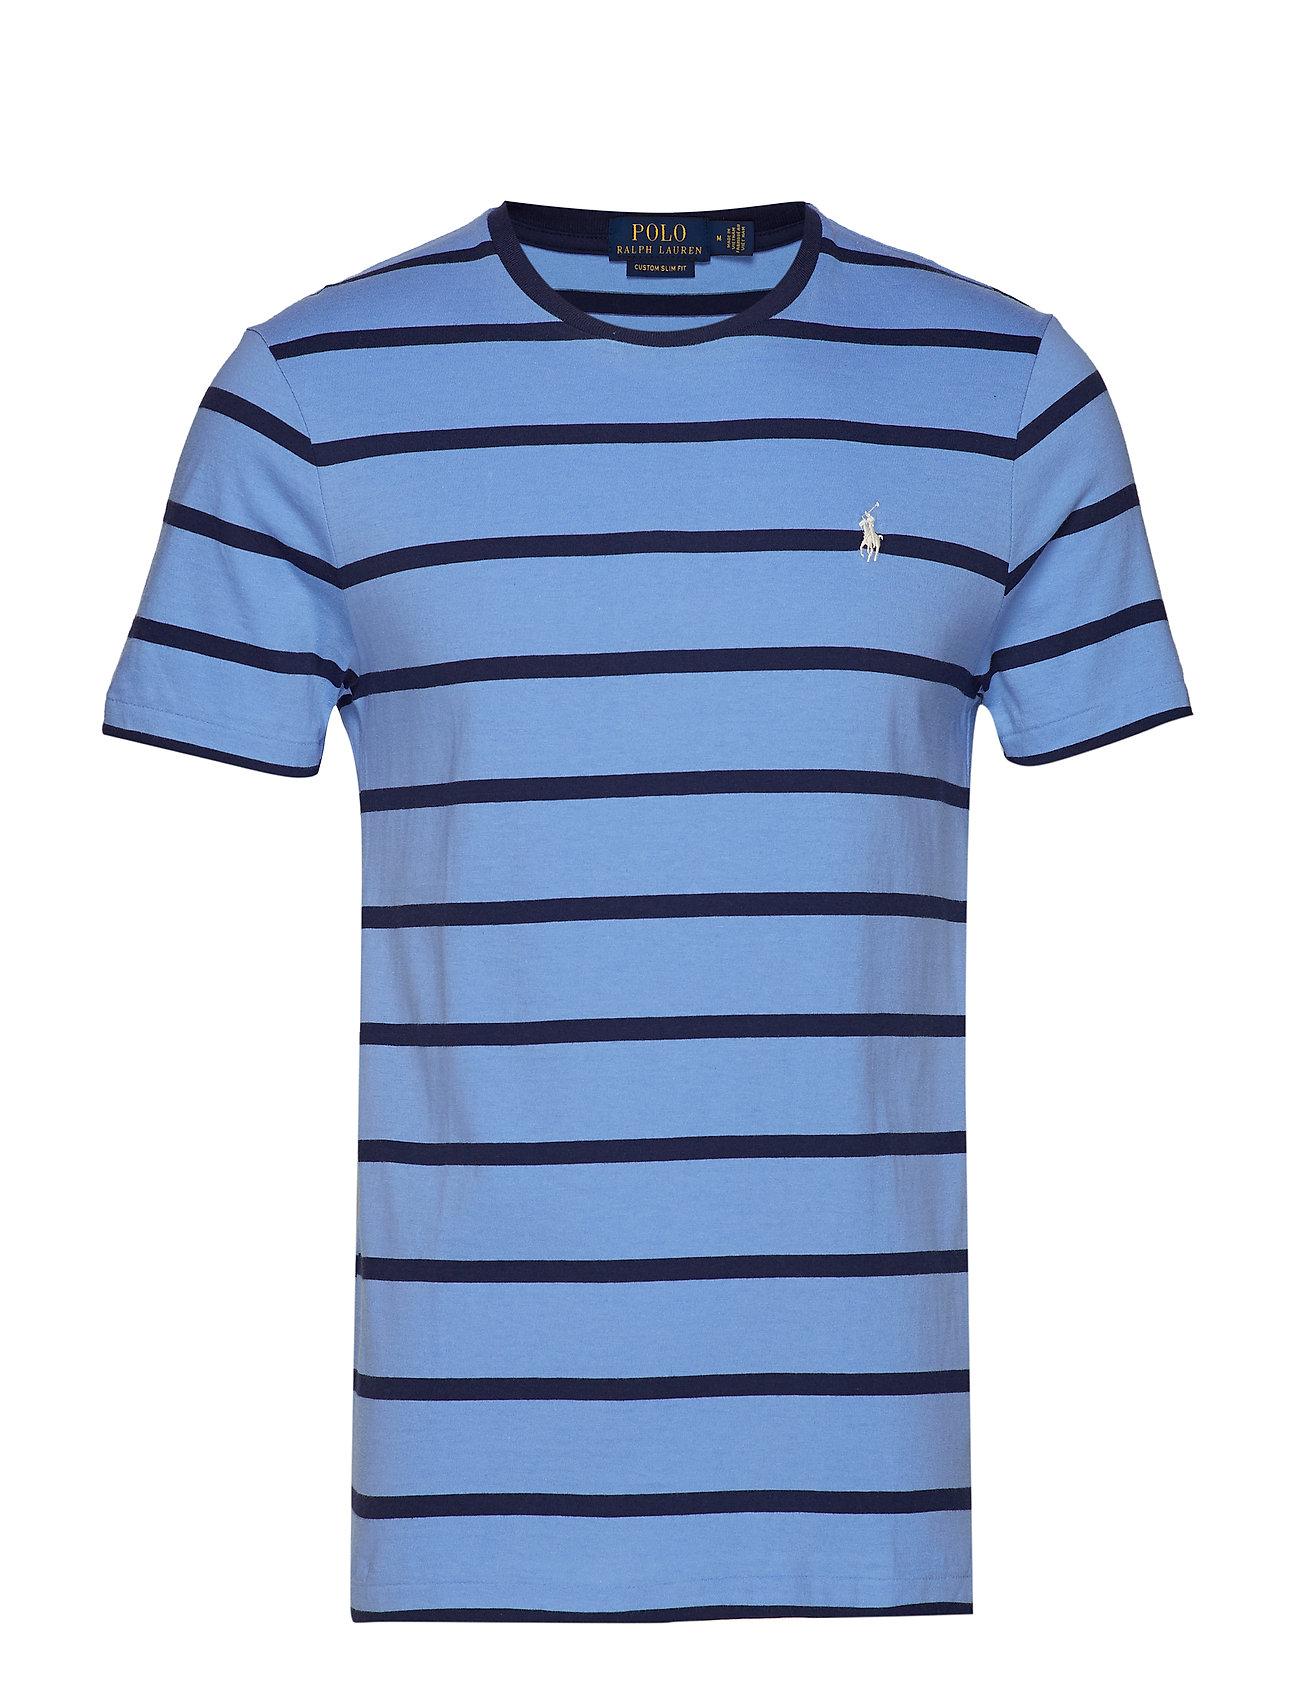 Polo Ralph Lauren Custom Slim Fit T-Shirt - CABANA BLUE/NEWPO